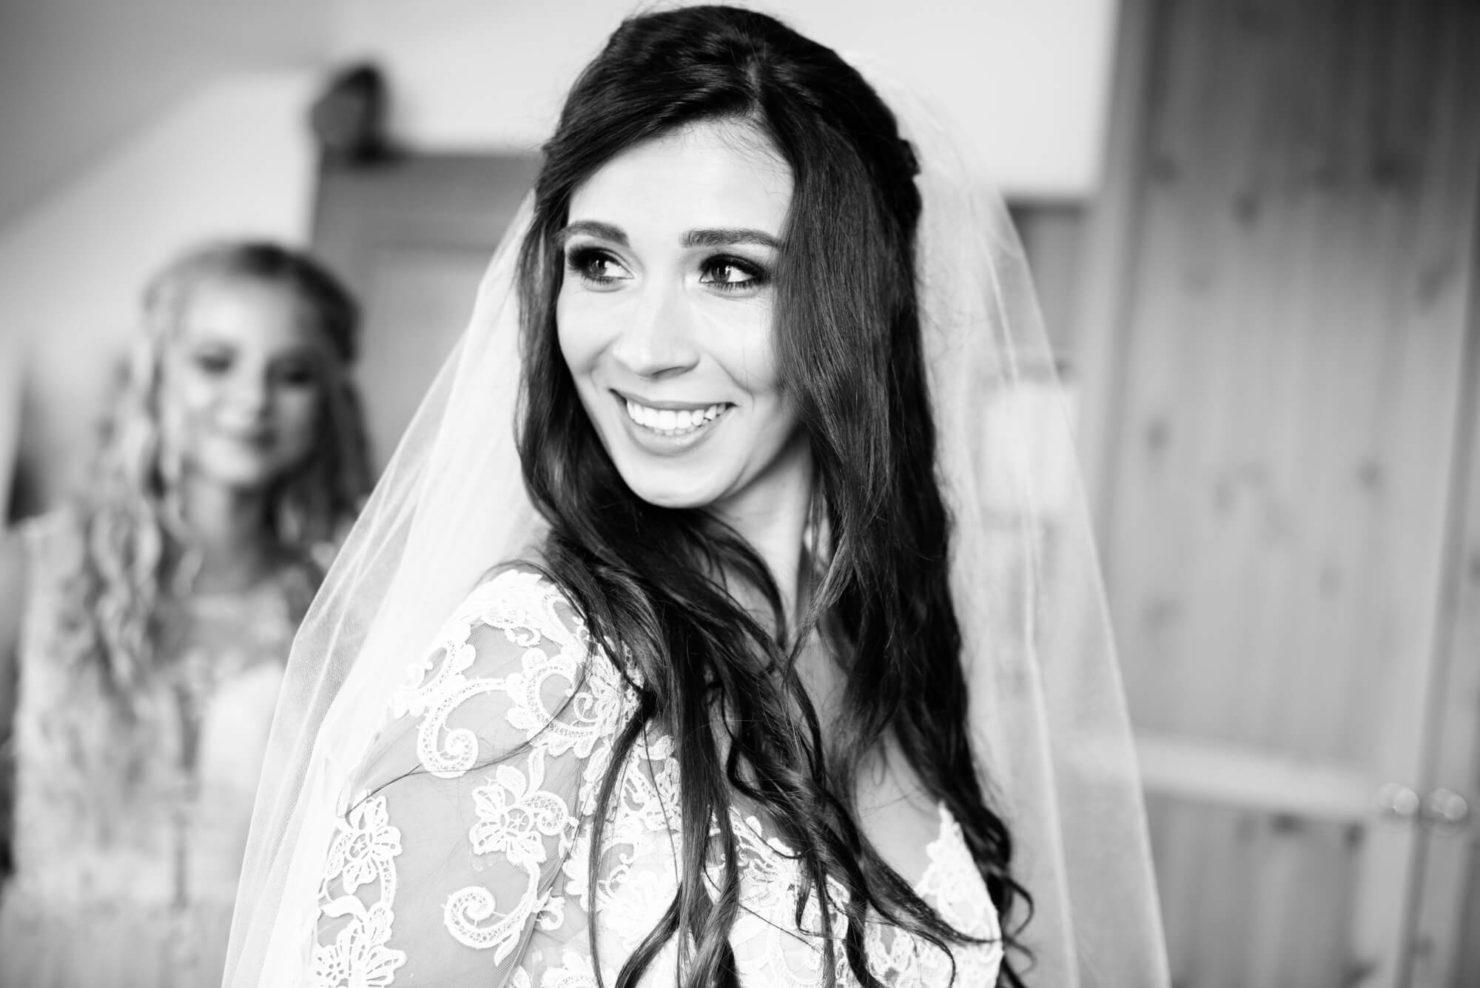 Panna Młoda-Ślub Warszawa-Villa Julianna-Fotografia Ślubna-White Balance weddings